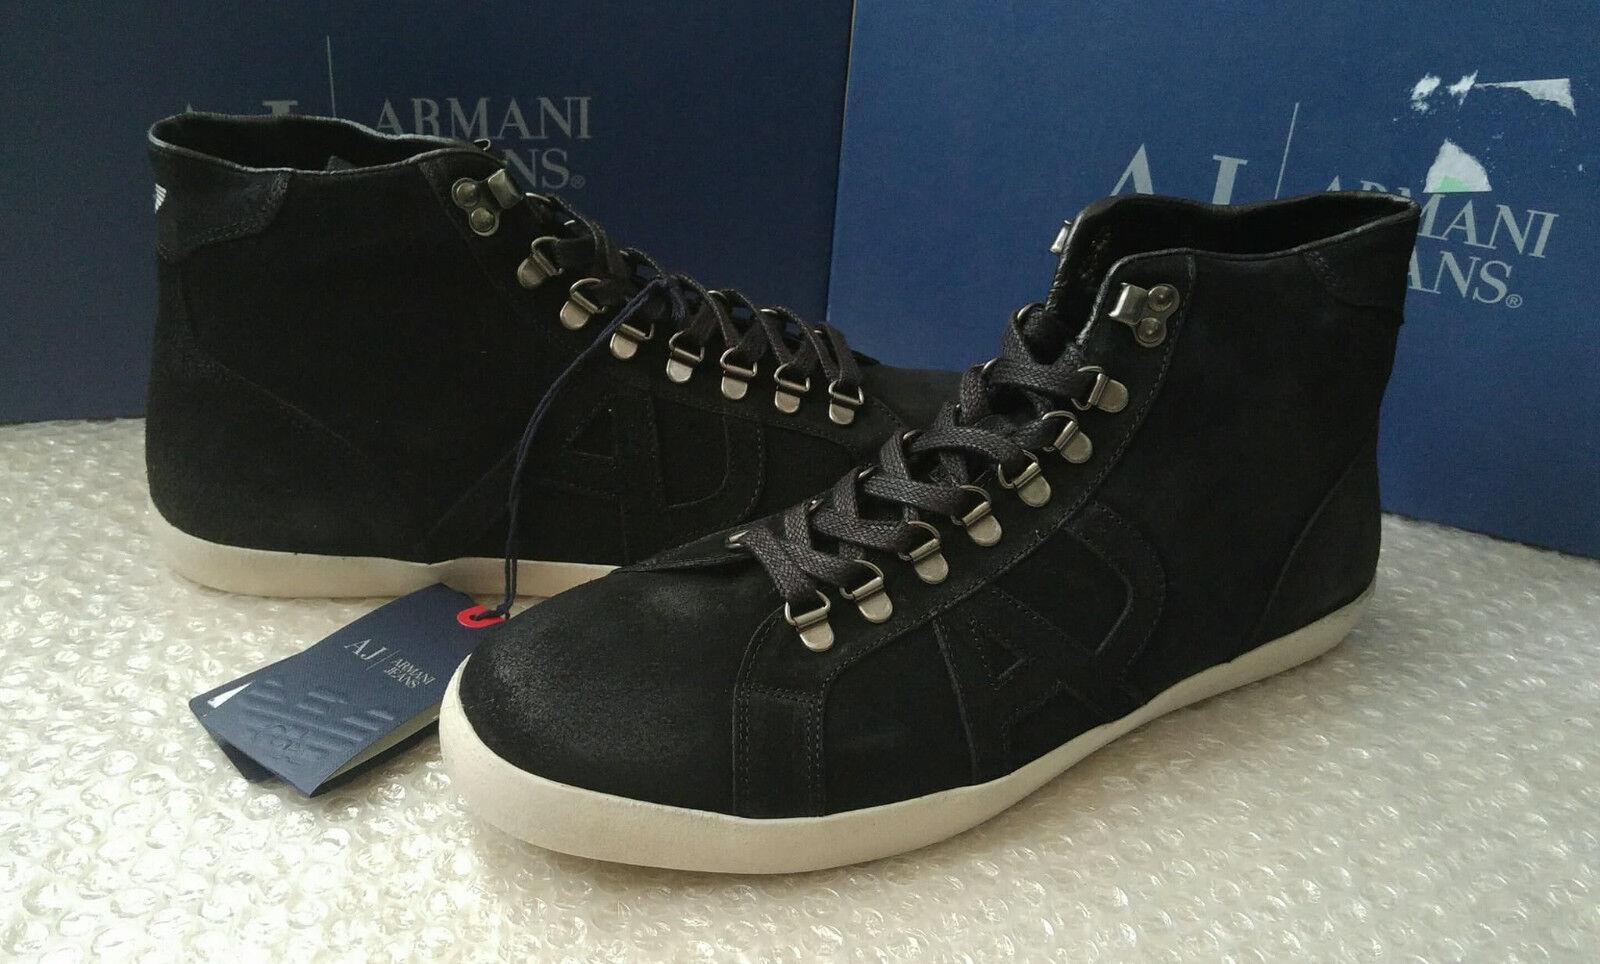 ARMANI Jeans Jeans Jeans Uomo Nero   Da Ginnastica Alte Top Taglia 9.5UK (44EU) 16fbfd